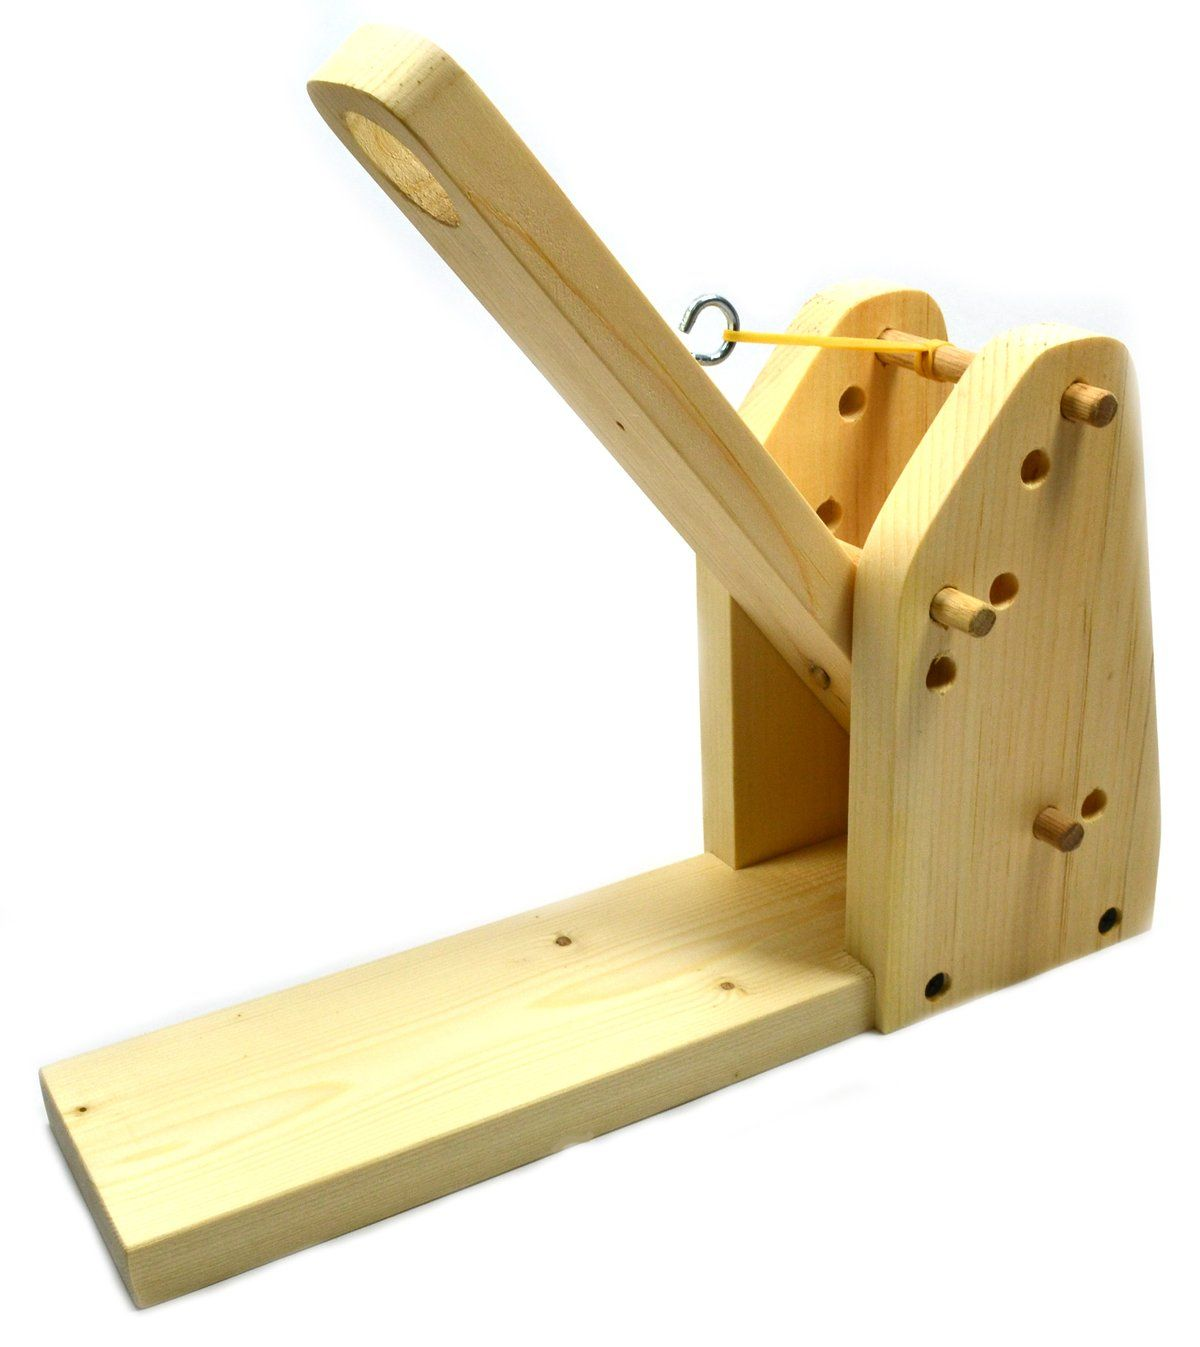 Eisco Garage Physics Catapult Kit | Catapult, Physics, Diy ...